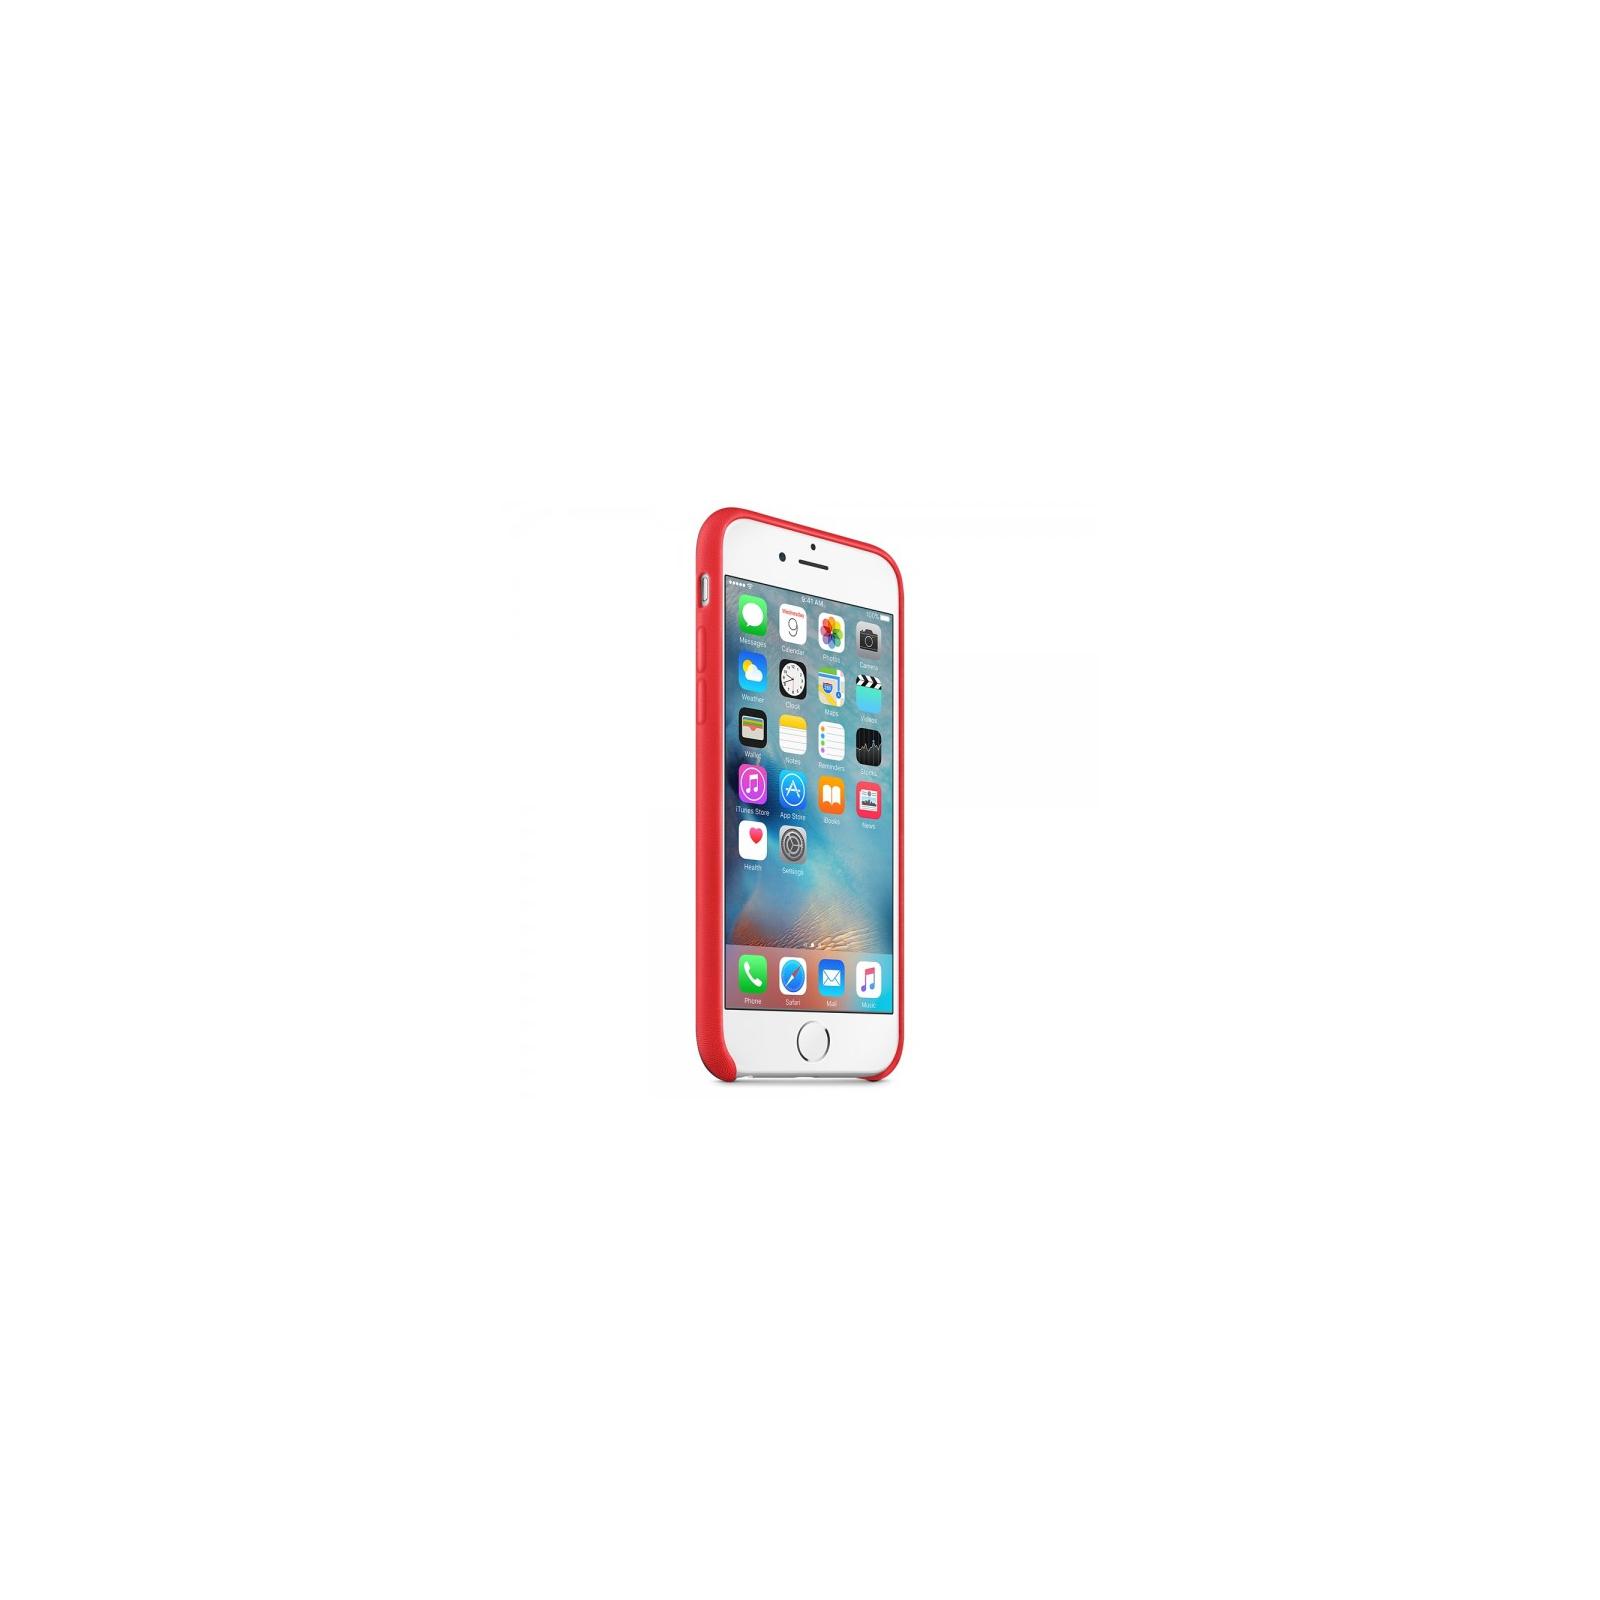 Чехол для моб. телефона Apple для iPhone 6/6s Antique White (MLCX2ZM/A) изображение 3